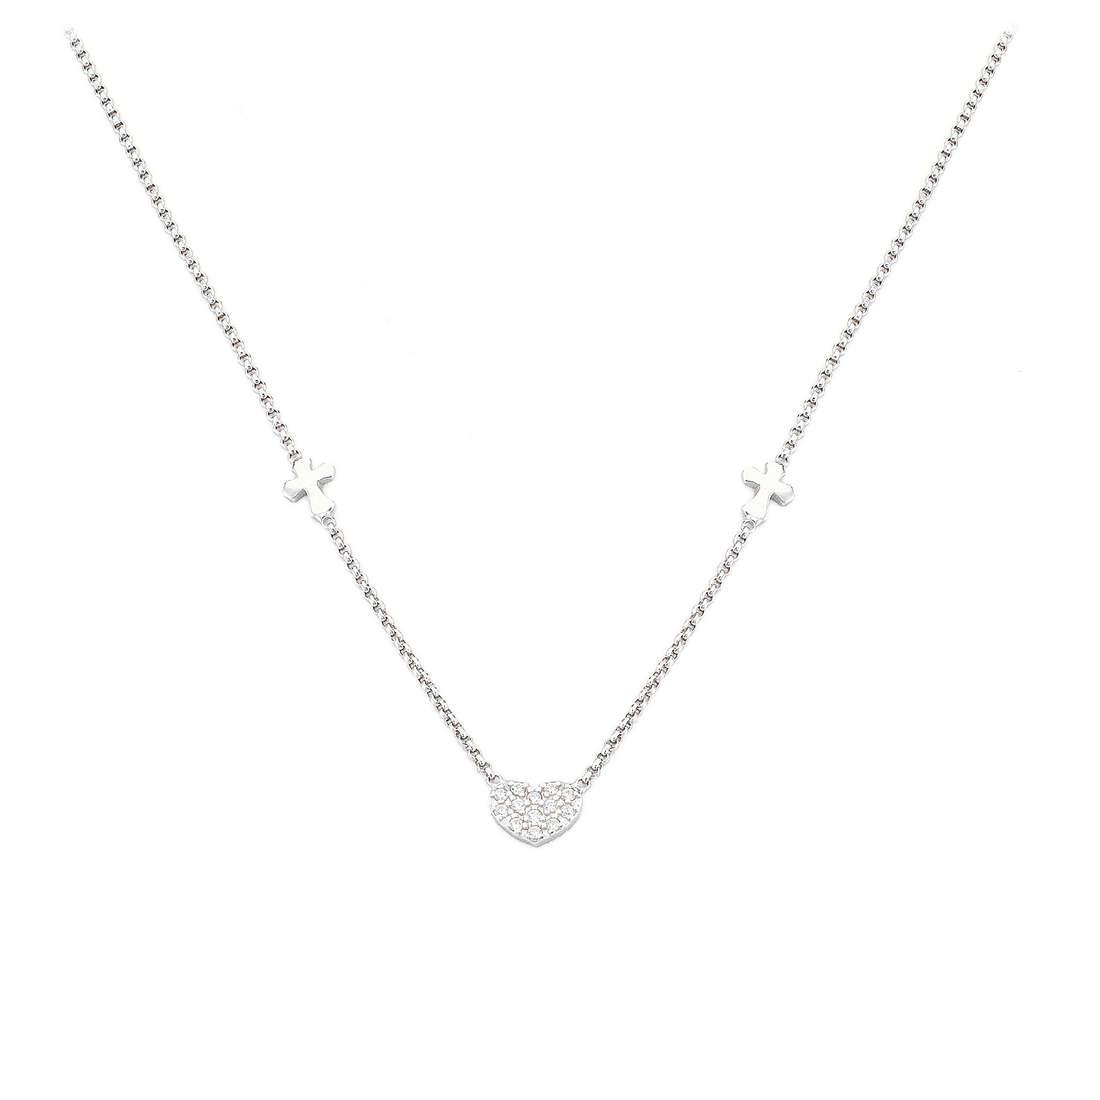 necklace woman jewellery Amen Prega, Ama CLCHZB3